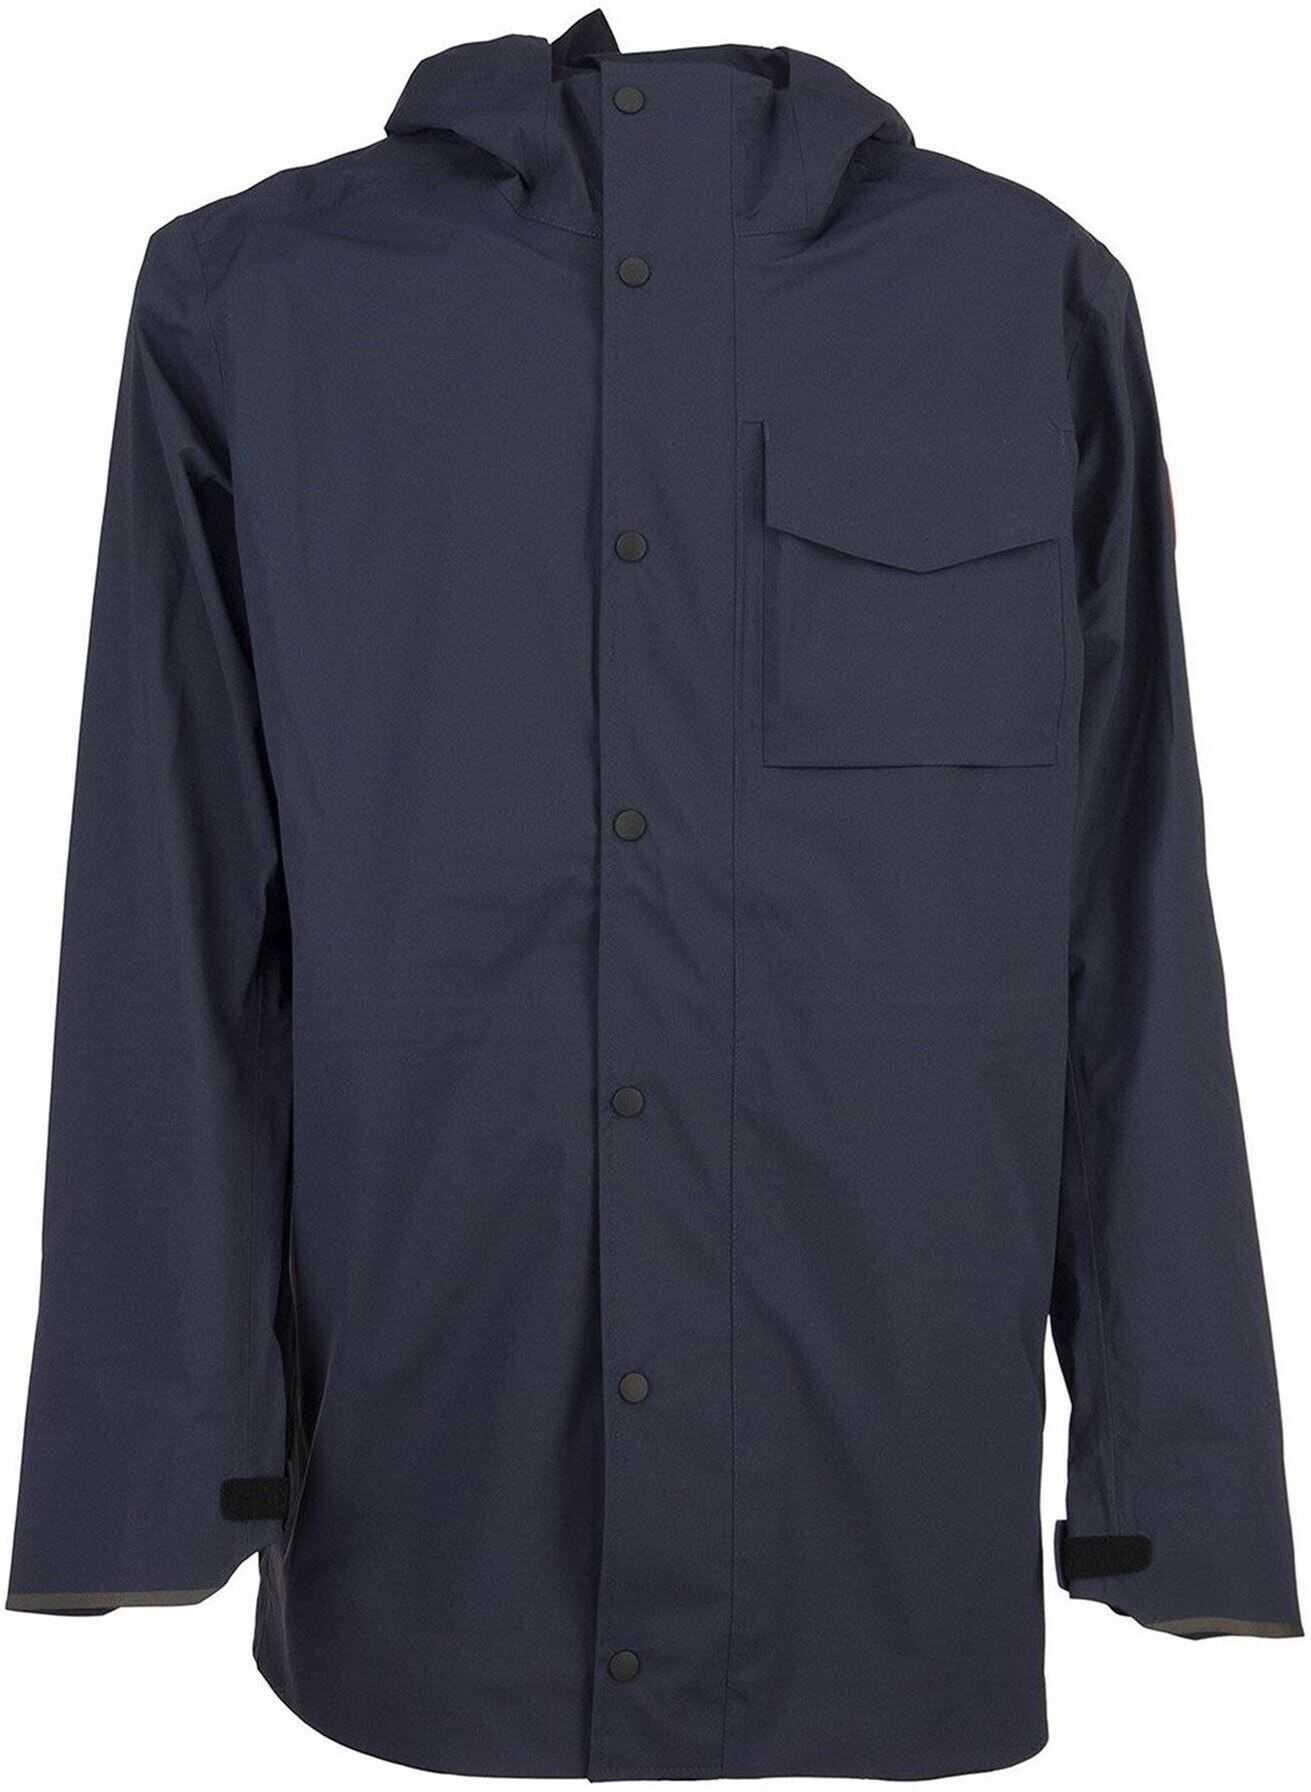 CANADA GOOSE Nanaimo Rain Jacket In Blue Blue imagine